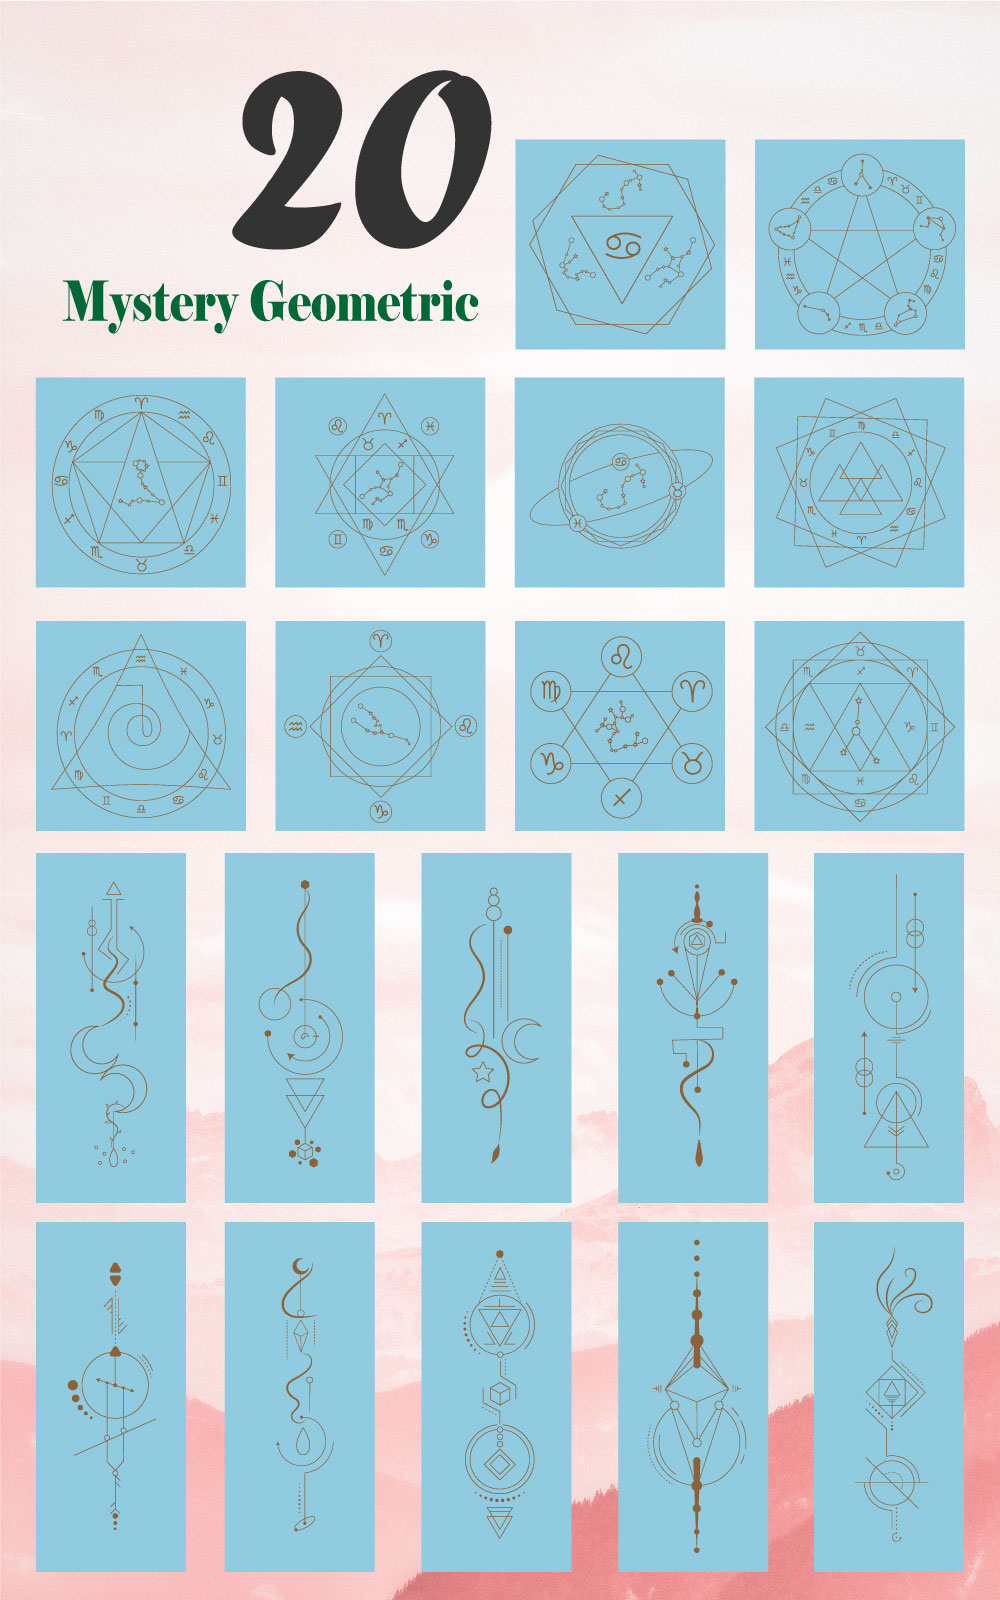 Mystery Geometric Elements